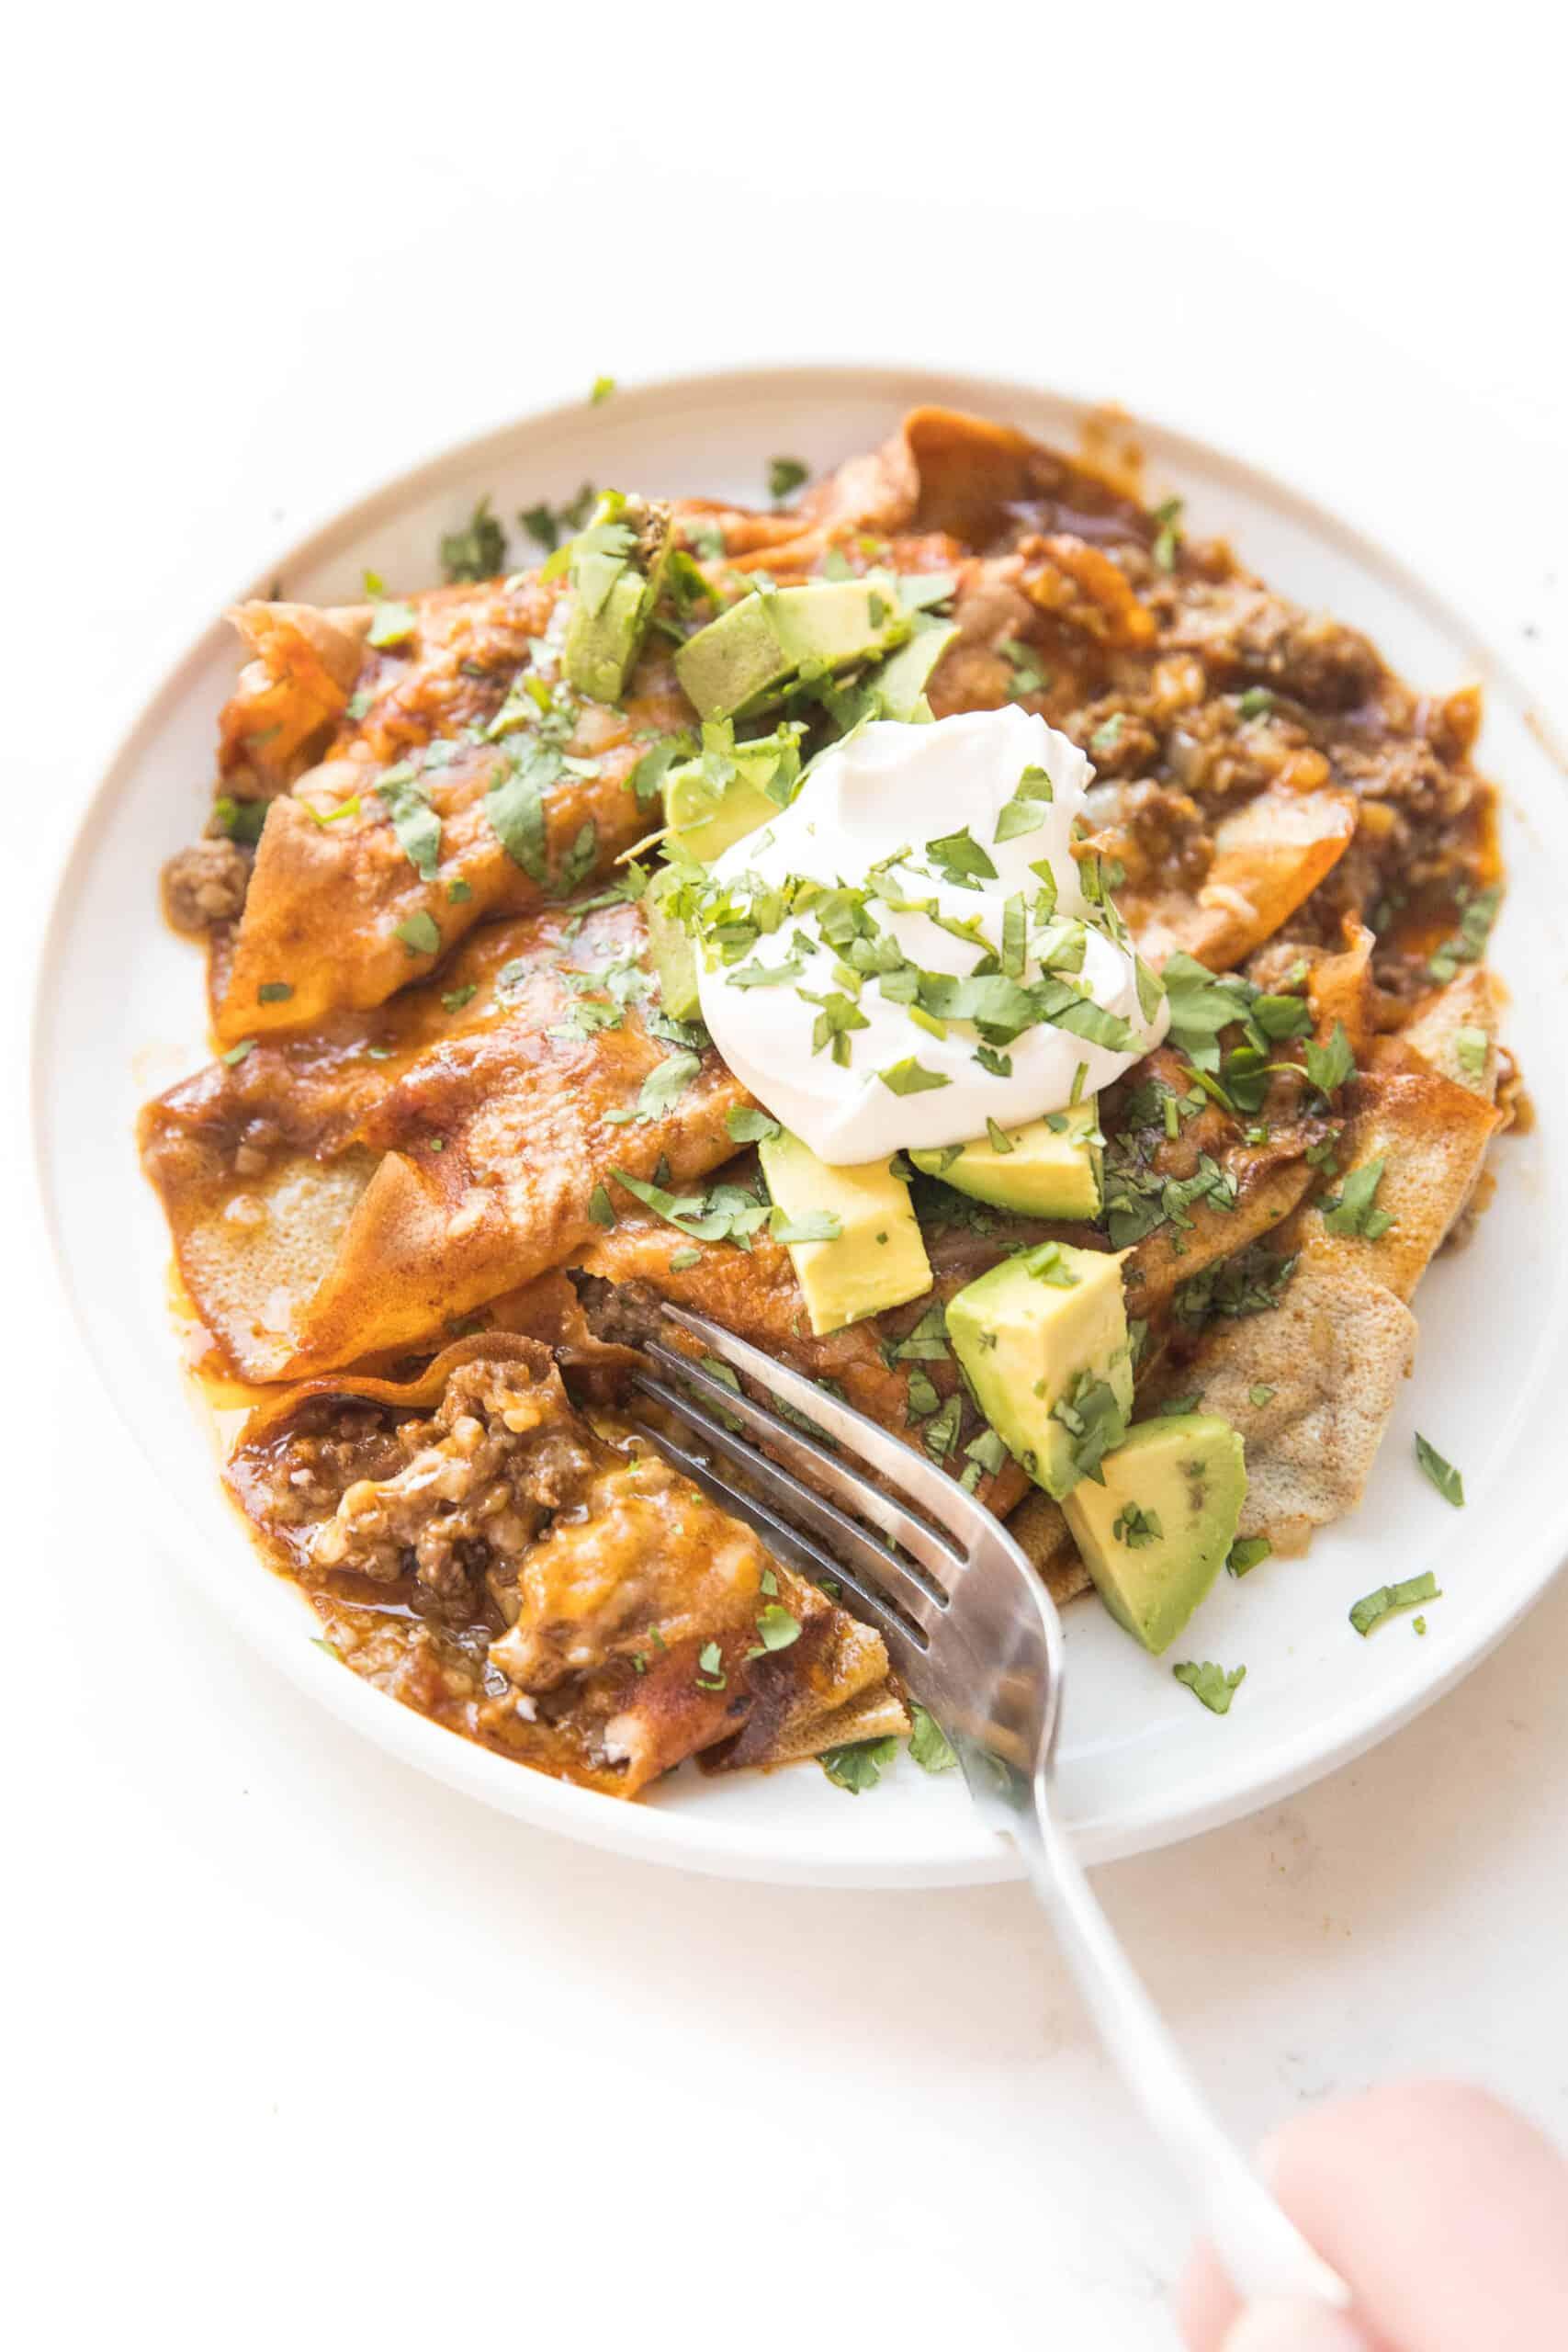 fork cutting in to keto beef enchiladas